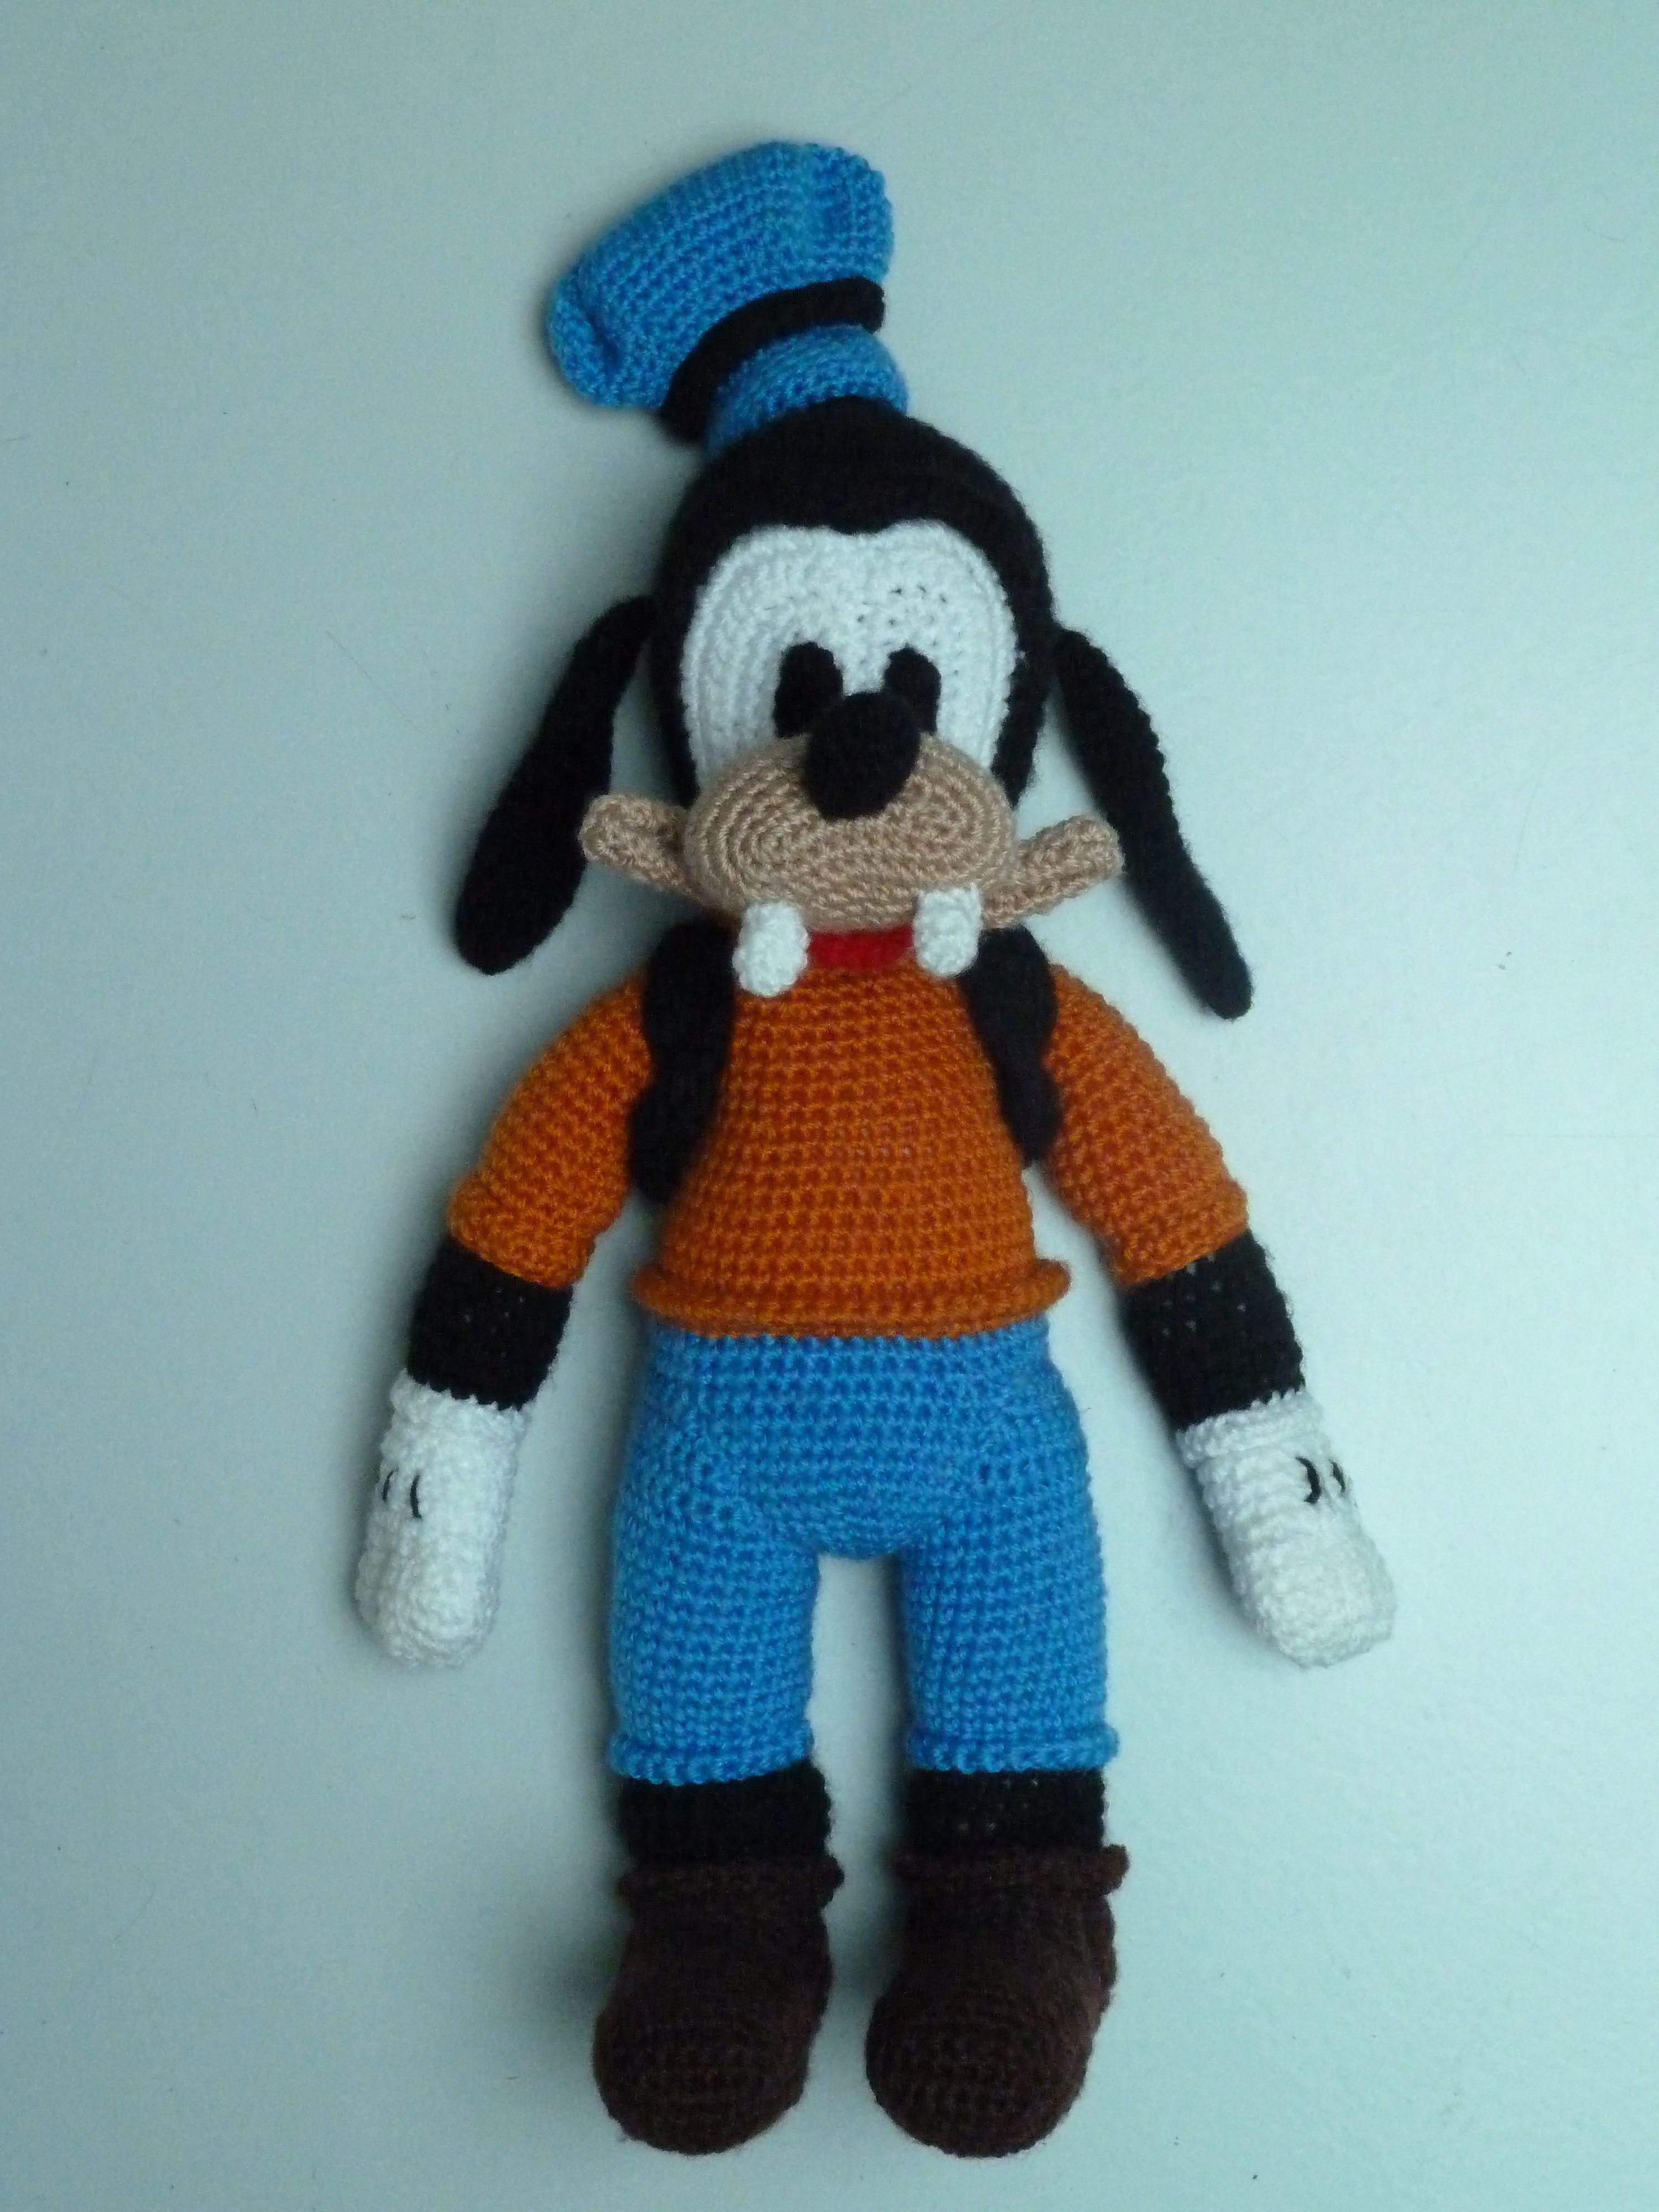 Amigurumi Goofy Handmade by Hilaria Fina | Haken - Disney ...